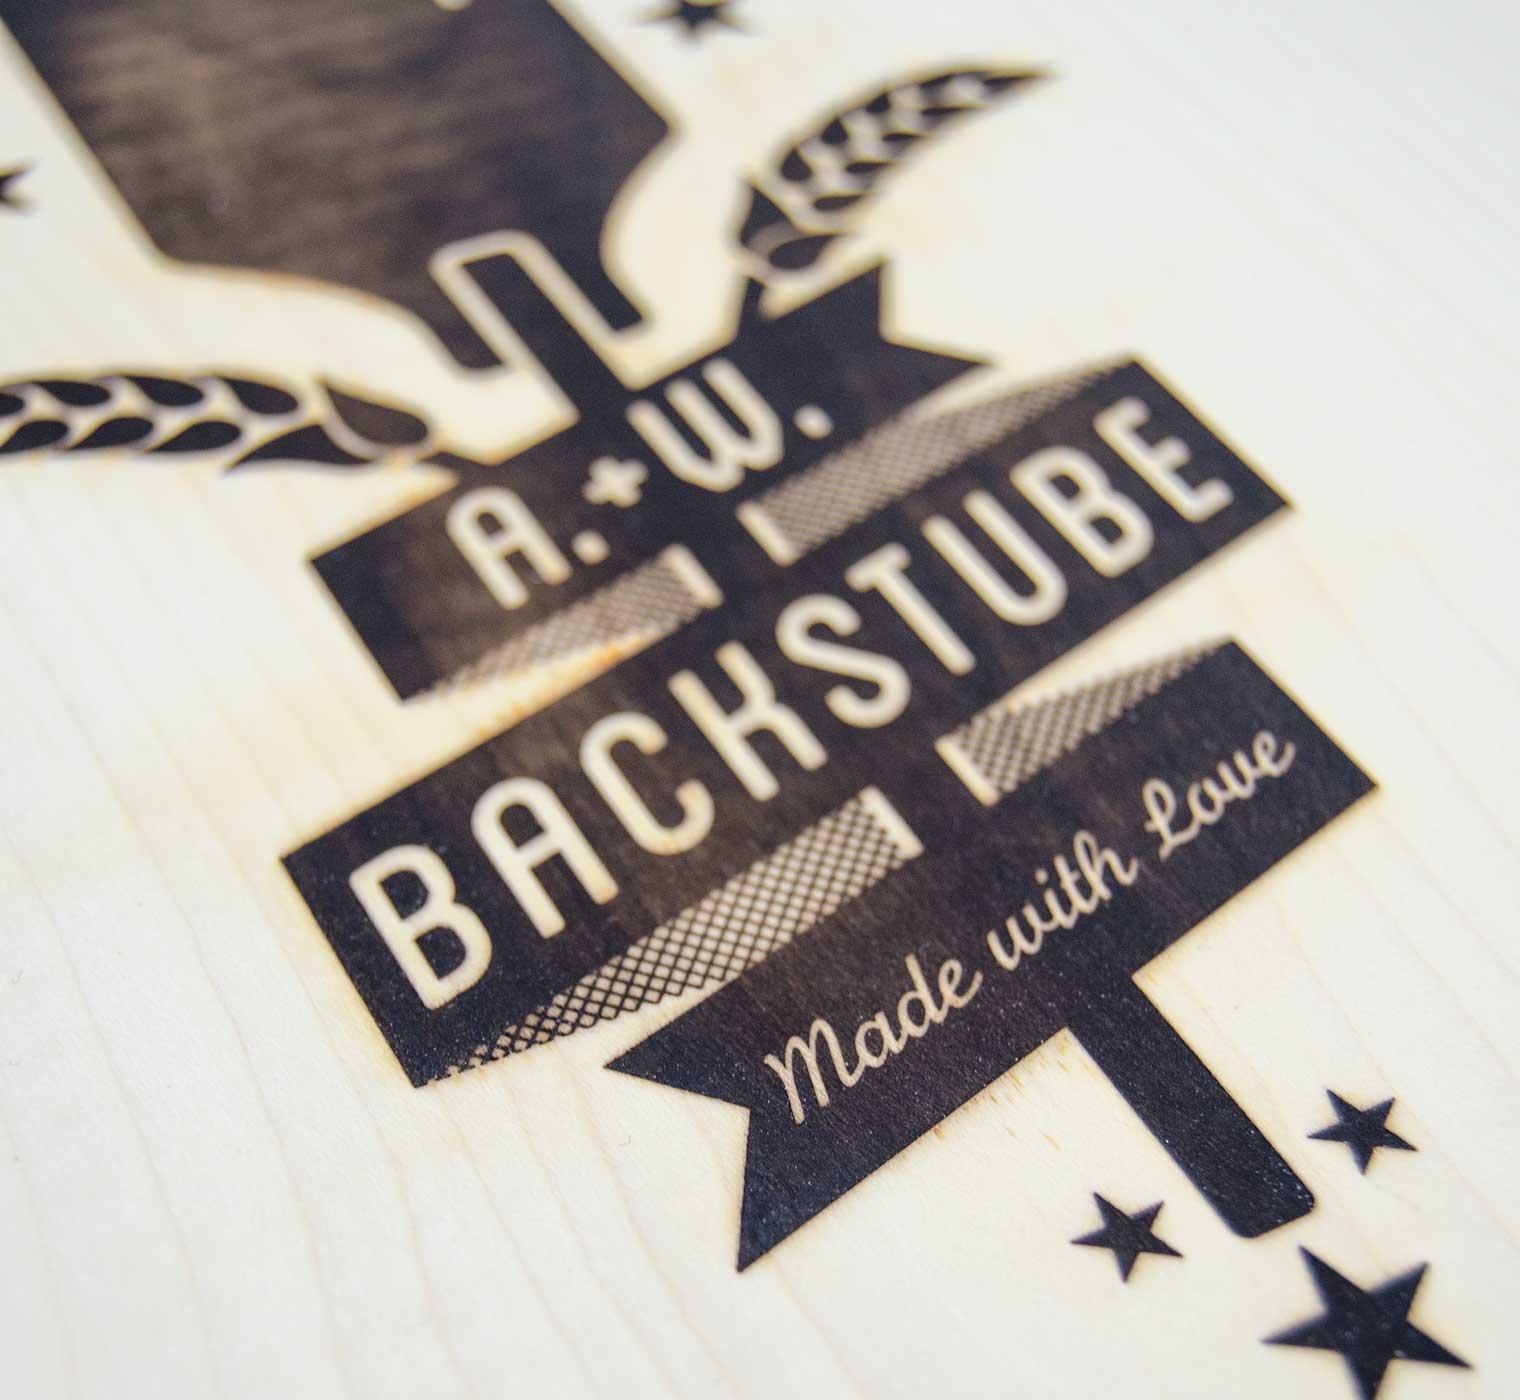 wallbach_brot6